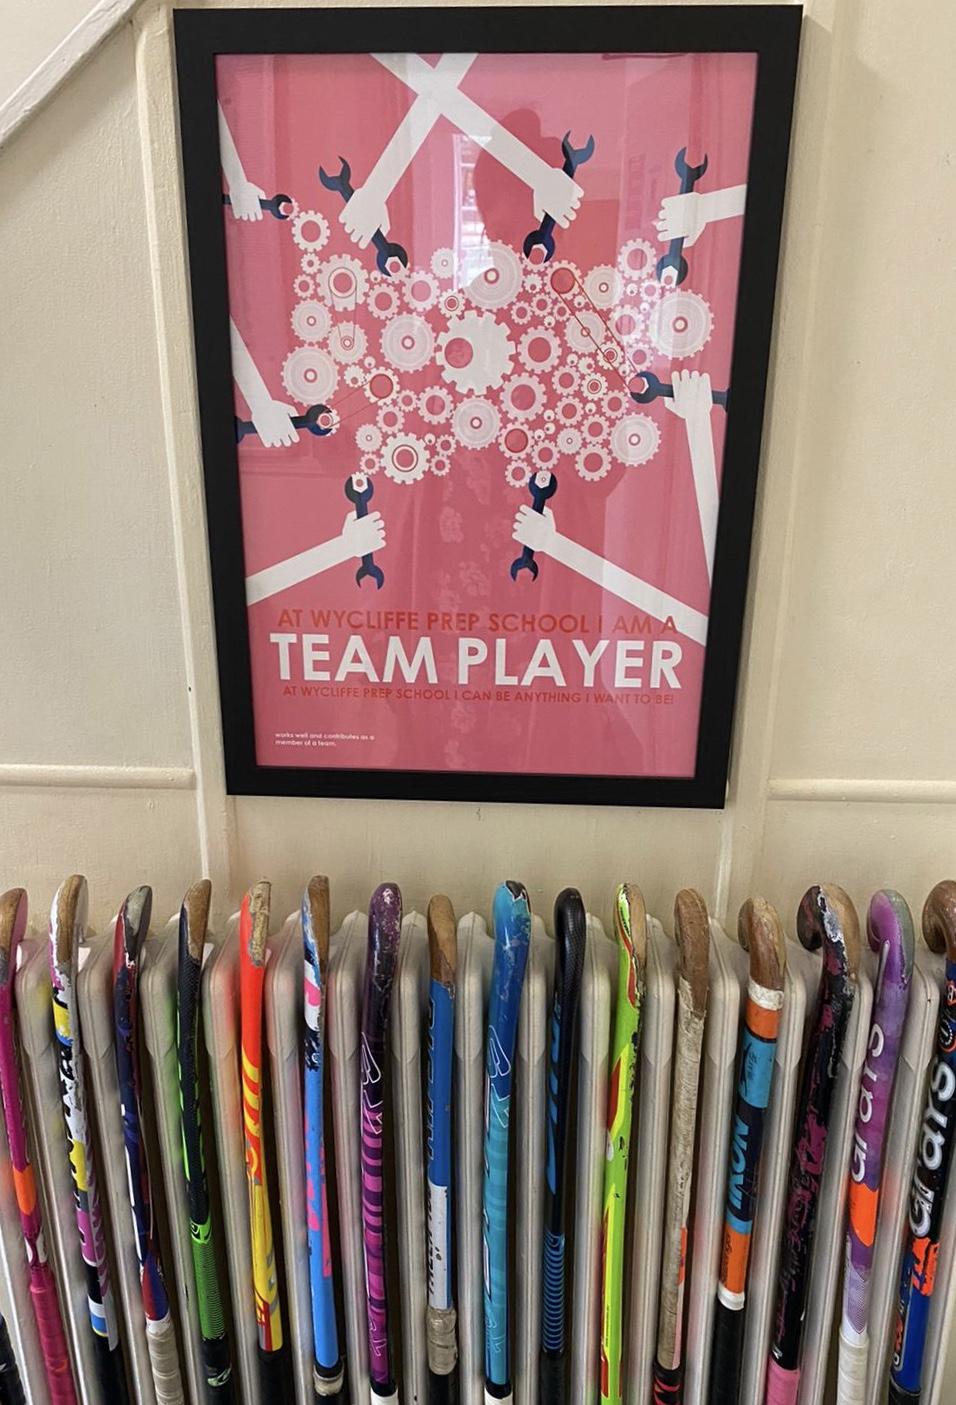 team player image in prep boarding school